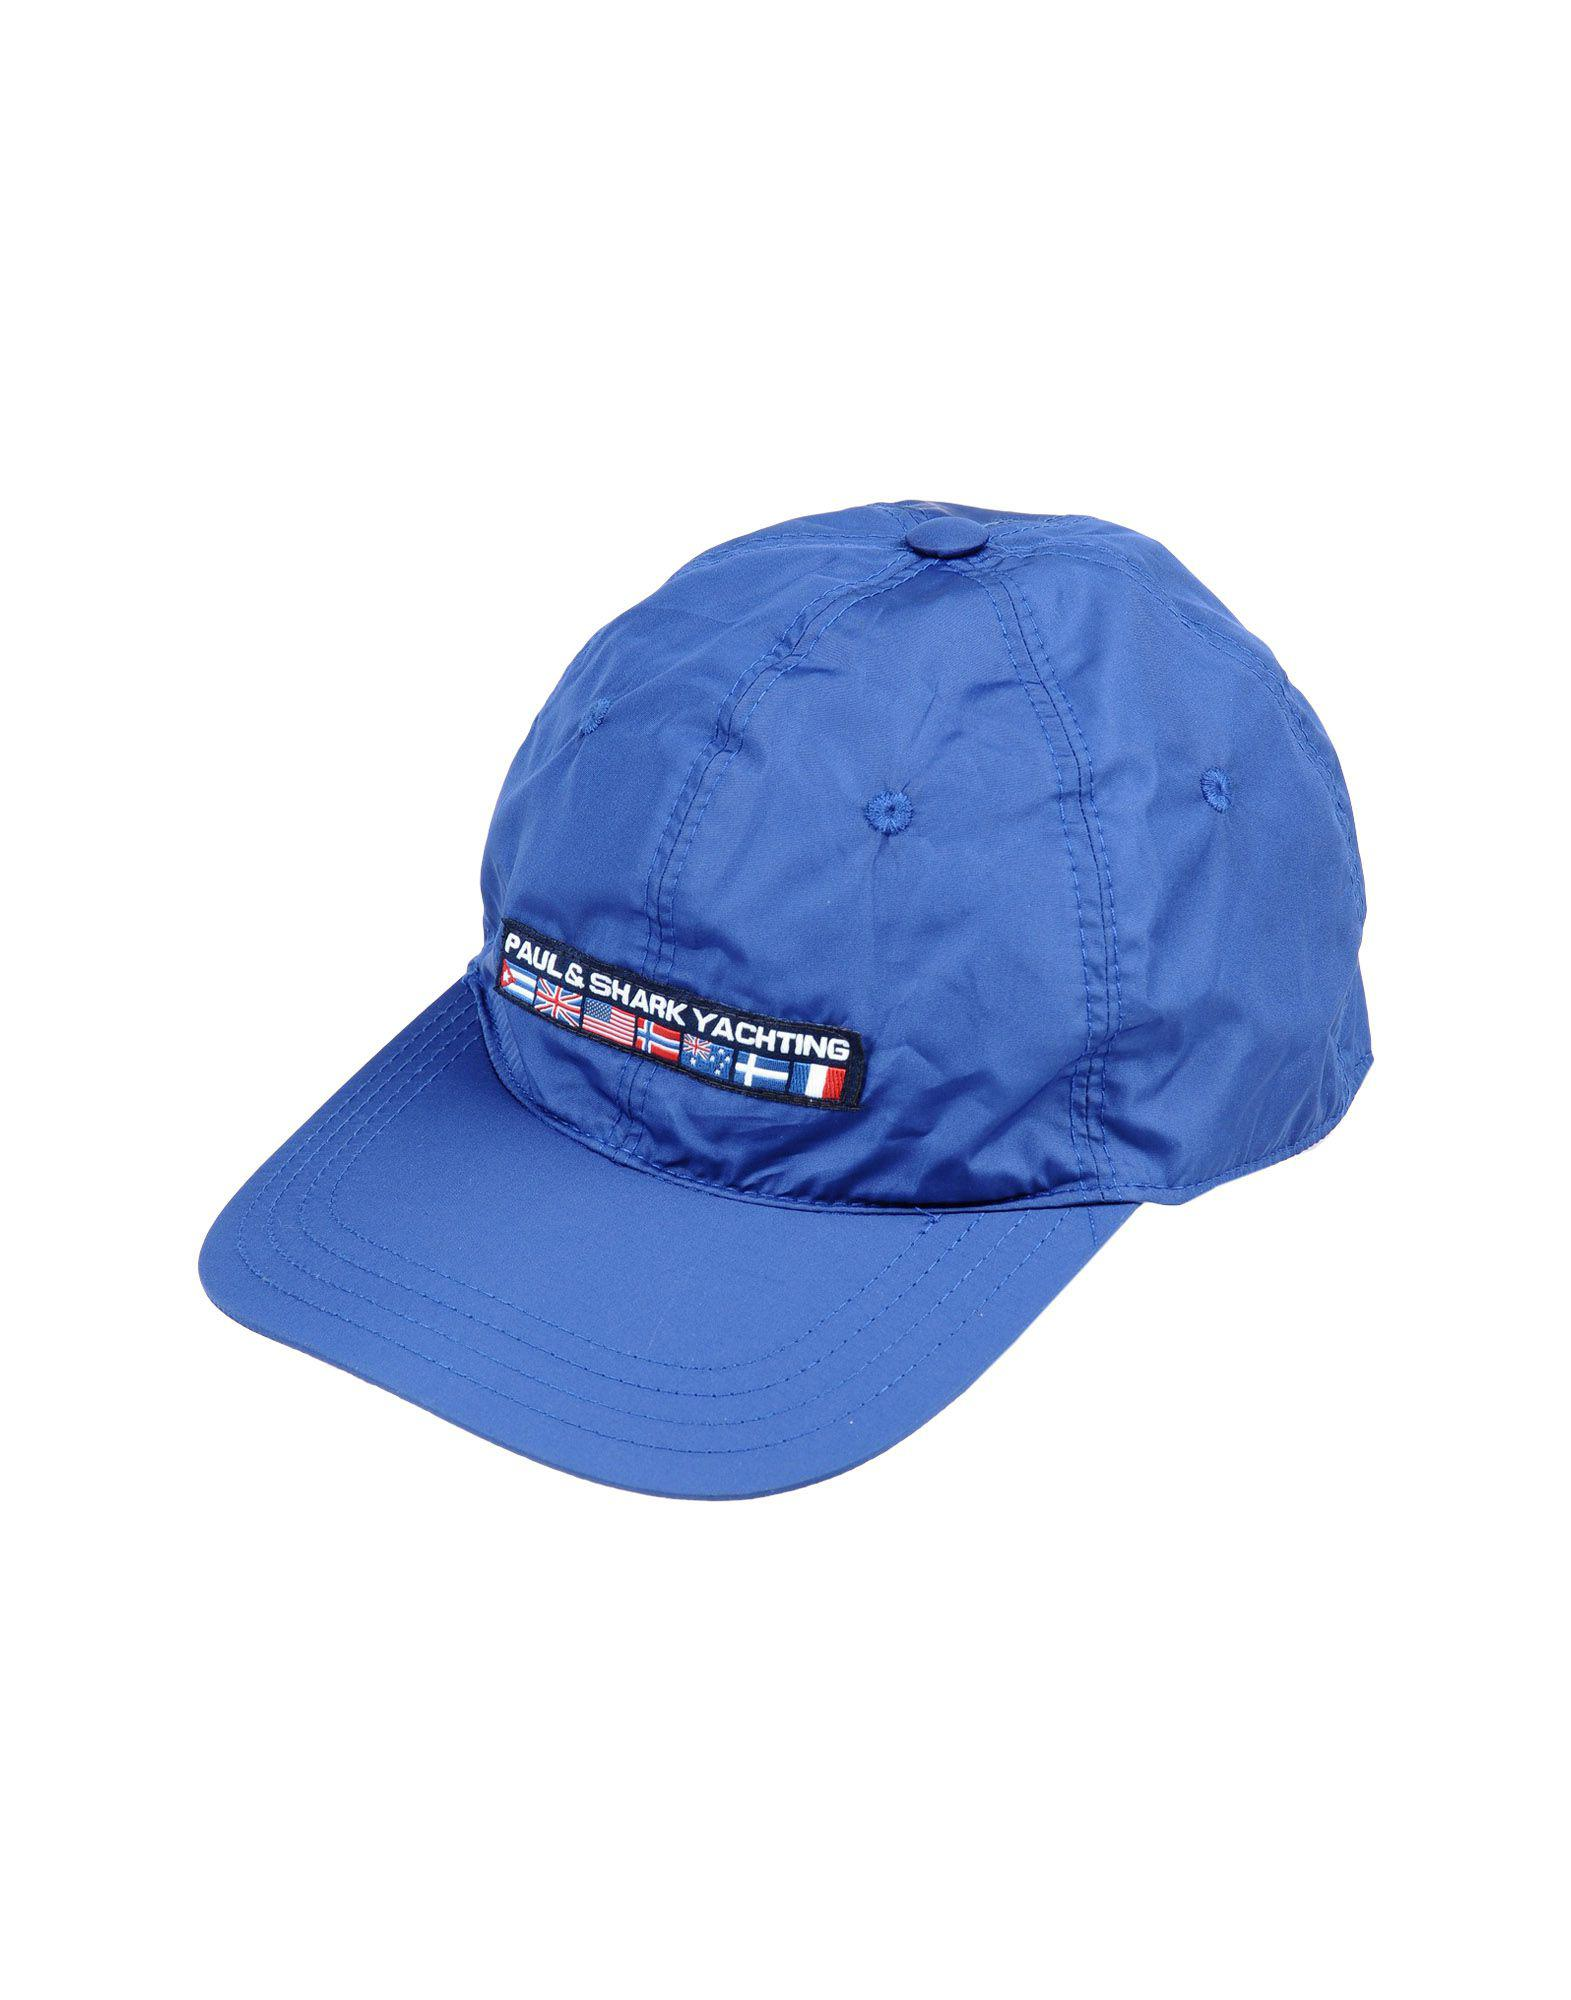 ... clearance ebay paul shark. mens blue hat 24edd f591d 7d048 3c4ff d2ac15ebae5e